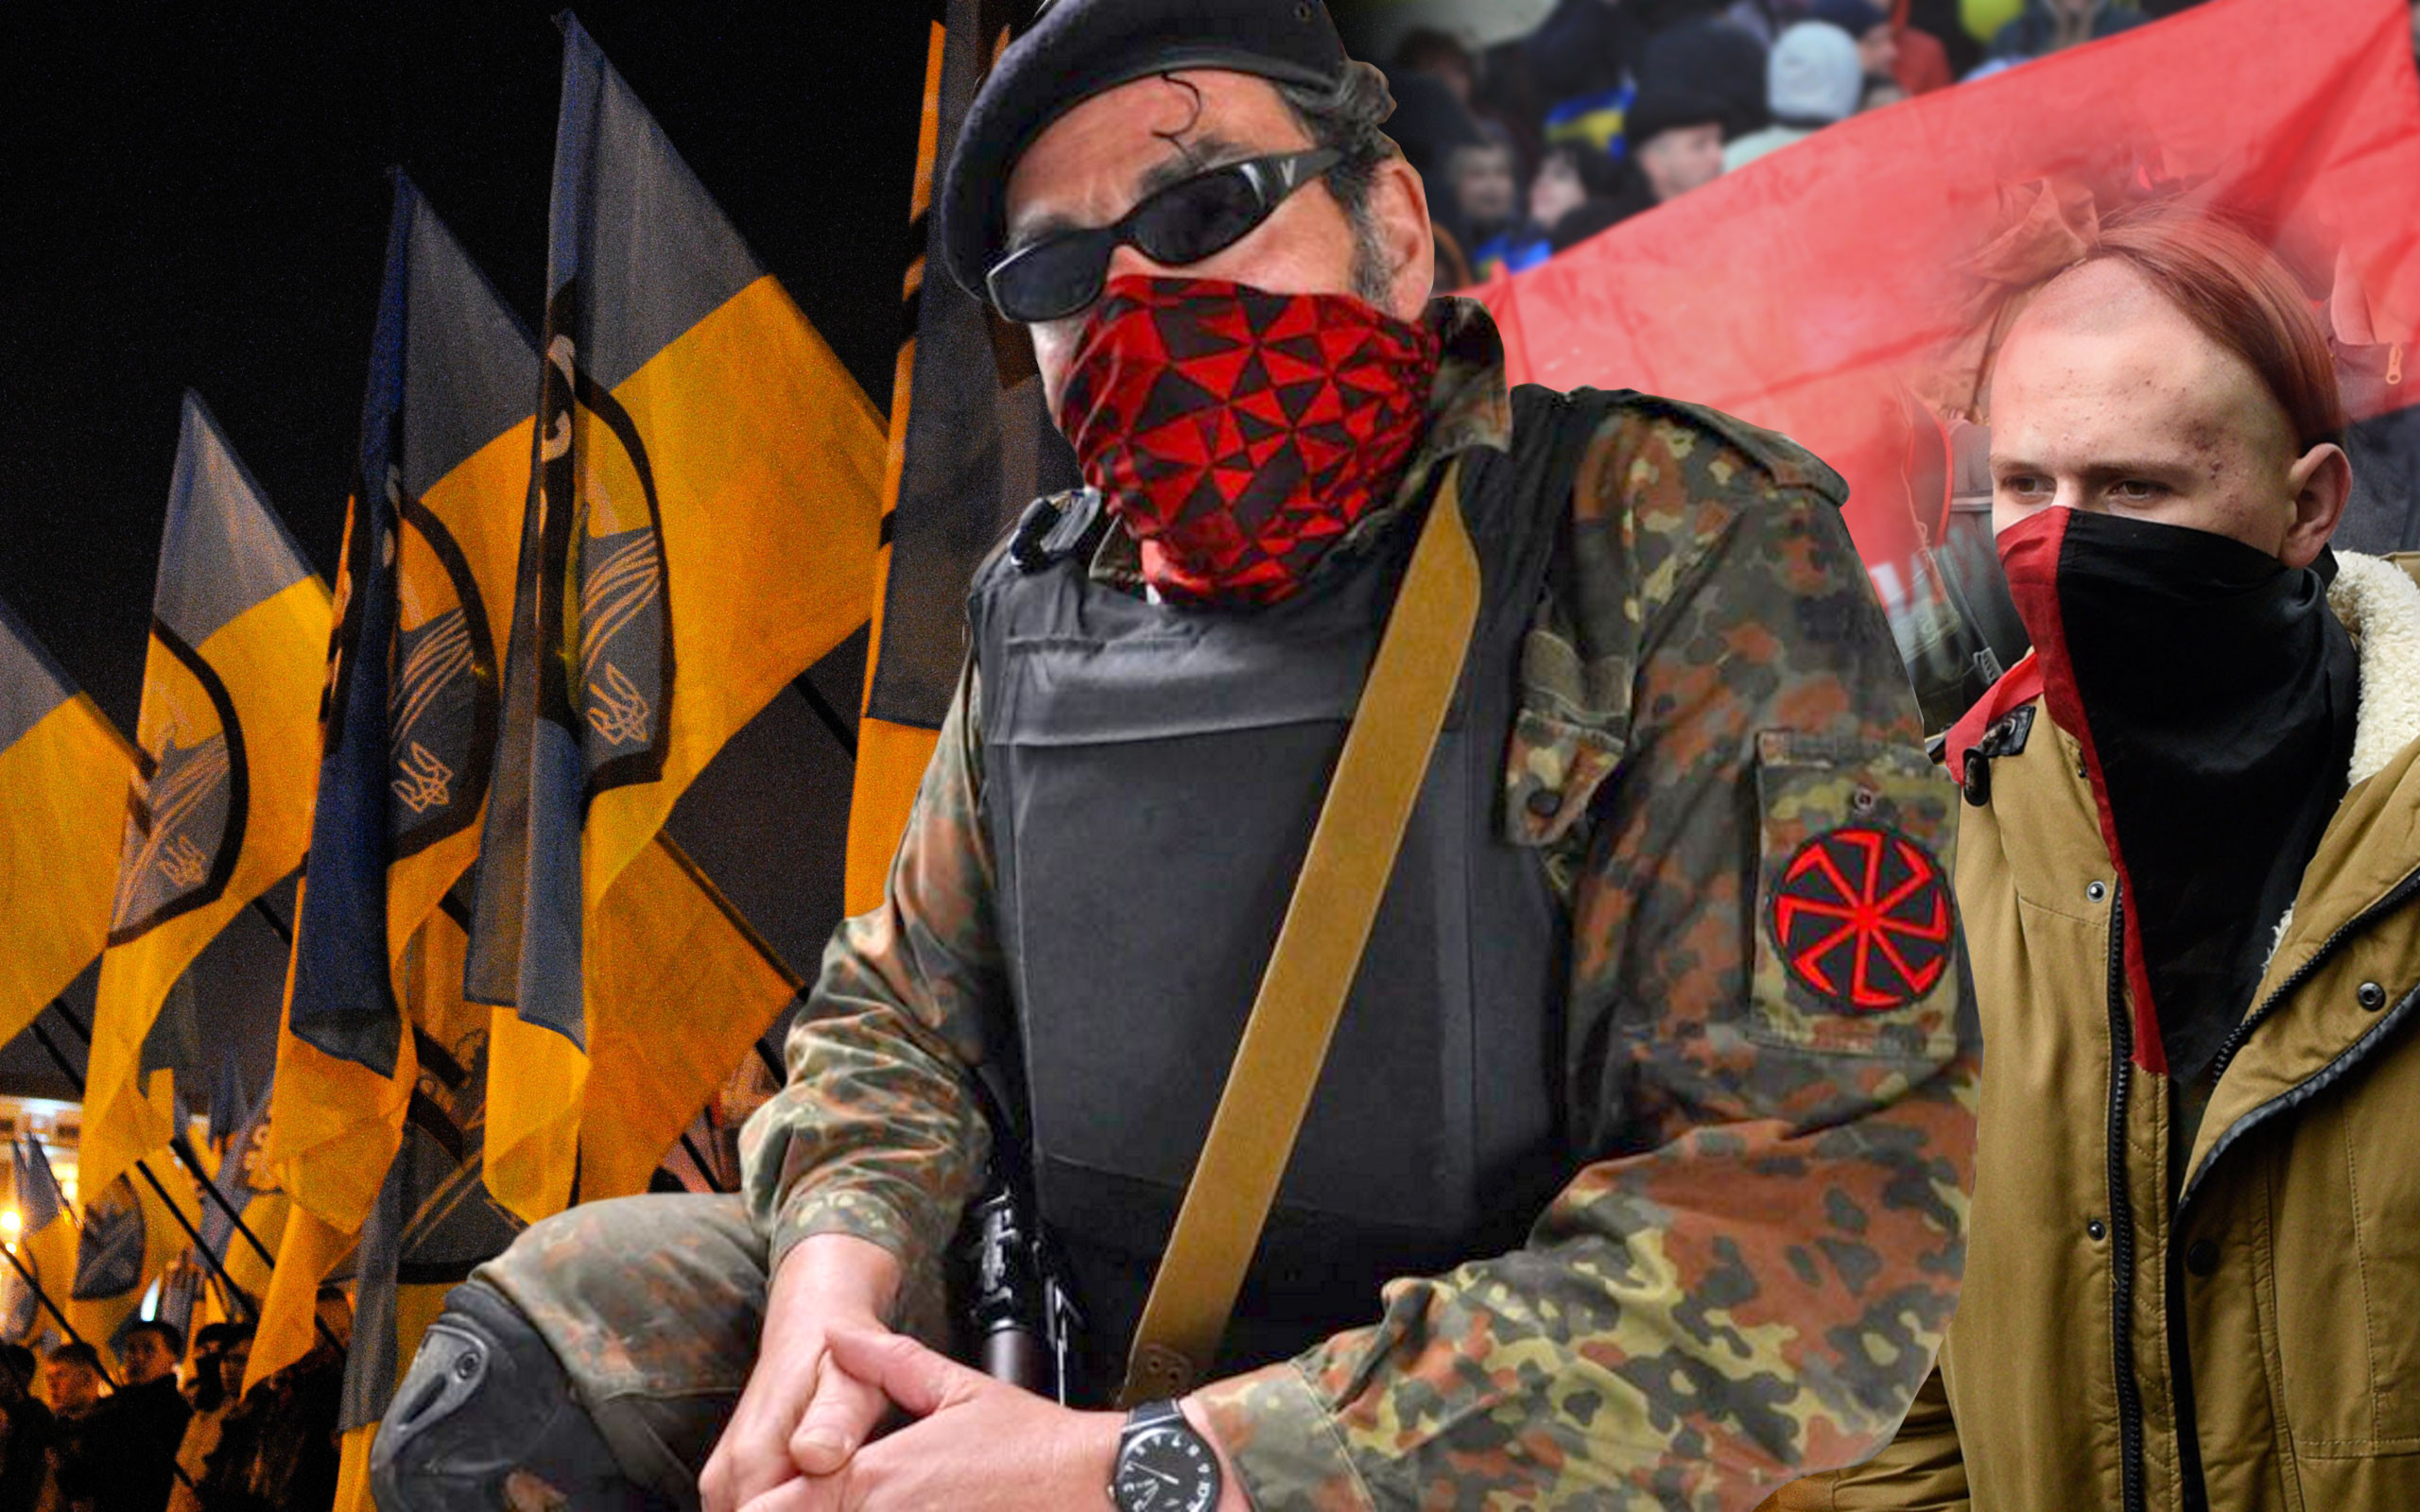 "<p>Коллжа. Фото: &copy;&nbsp;<a href=""https://twitter.com/NovorossiaInfo/status/616696369210724356/photo/1?ref_src=twsrc%5Etfw"" target=""_blank"">twitter.com,</a>&nbsp;РИА Новости</p>"